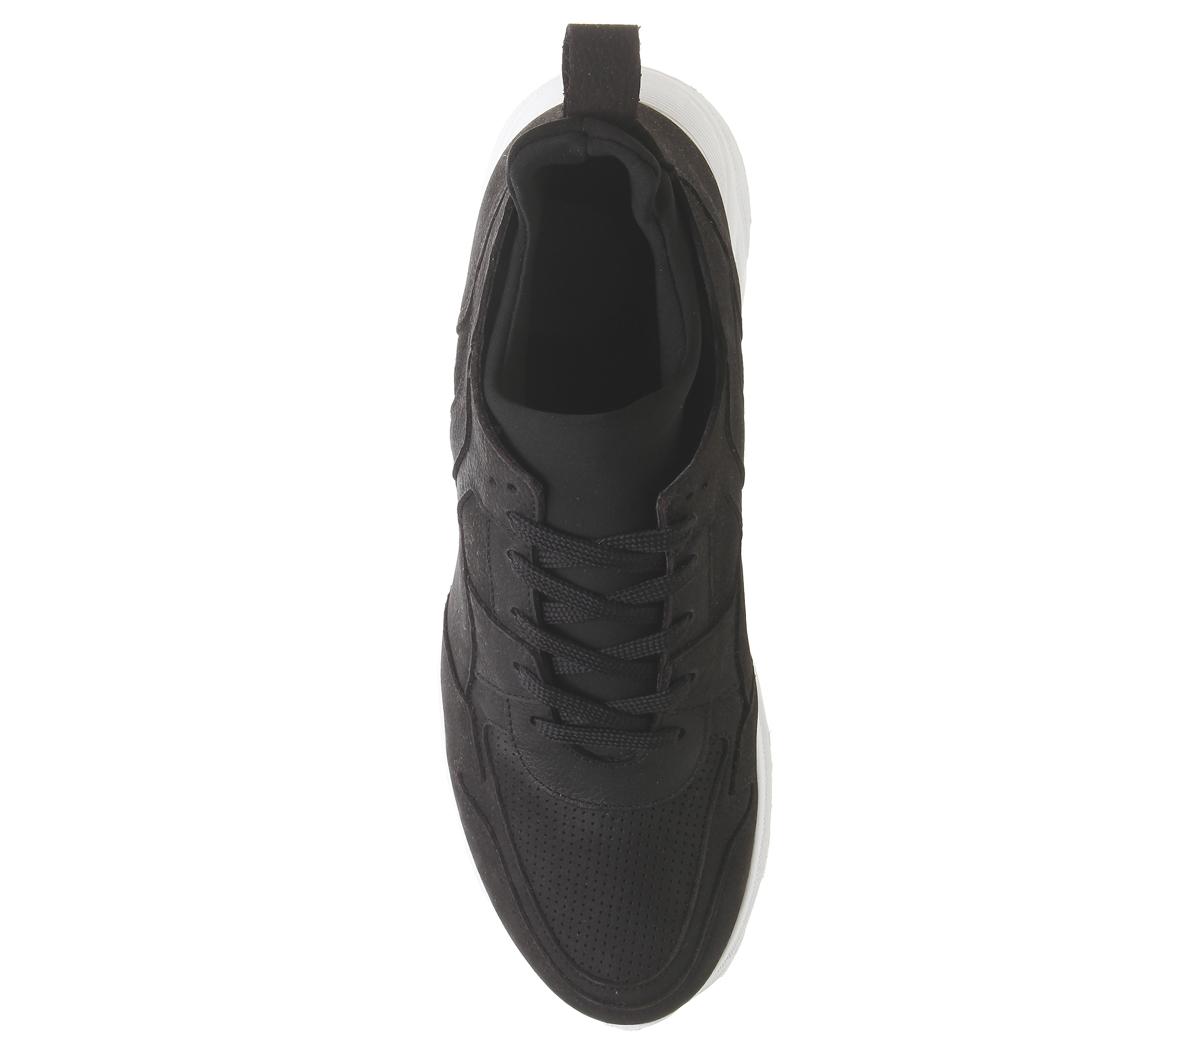 Mens-Office-Lacrosse-Trainers-Black-Nubuck-Casual-Shoes thumbnail 9